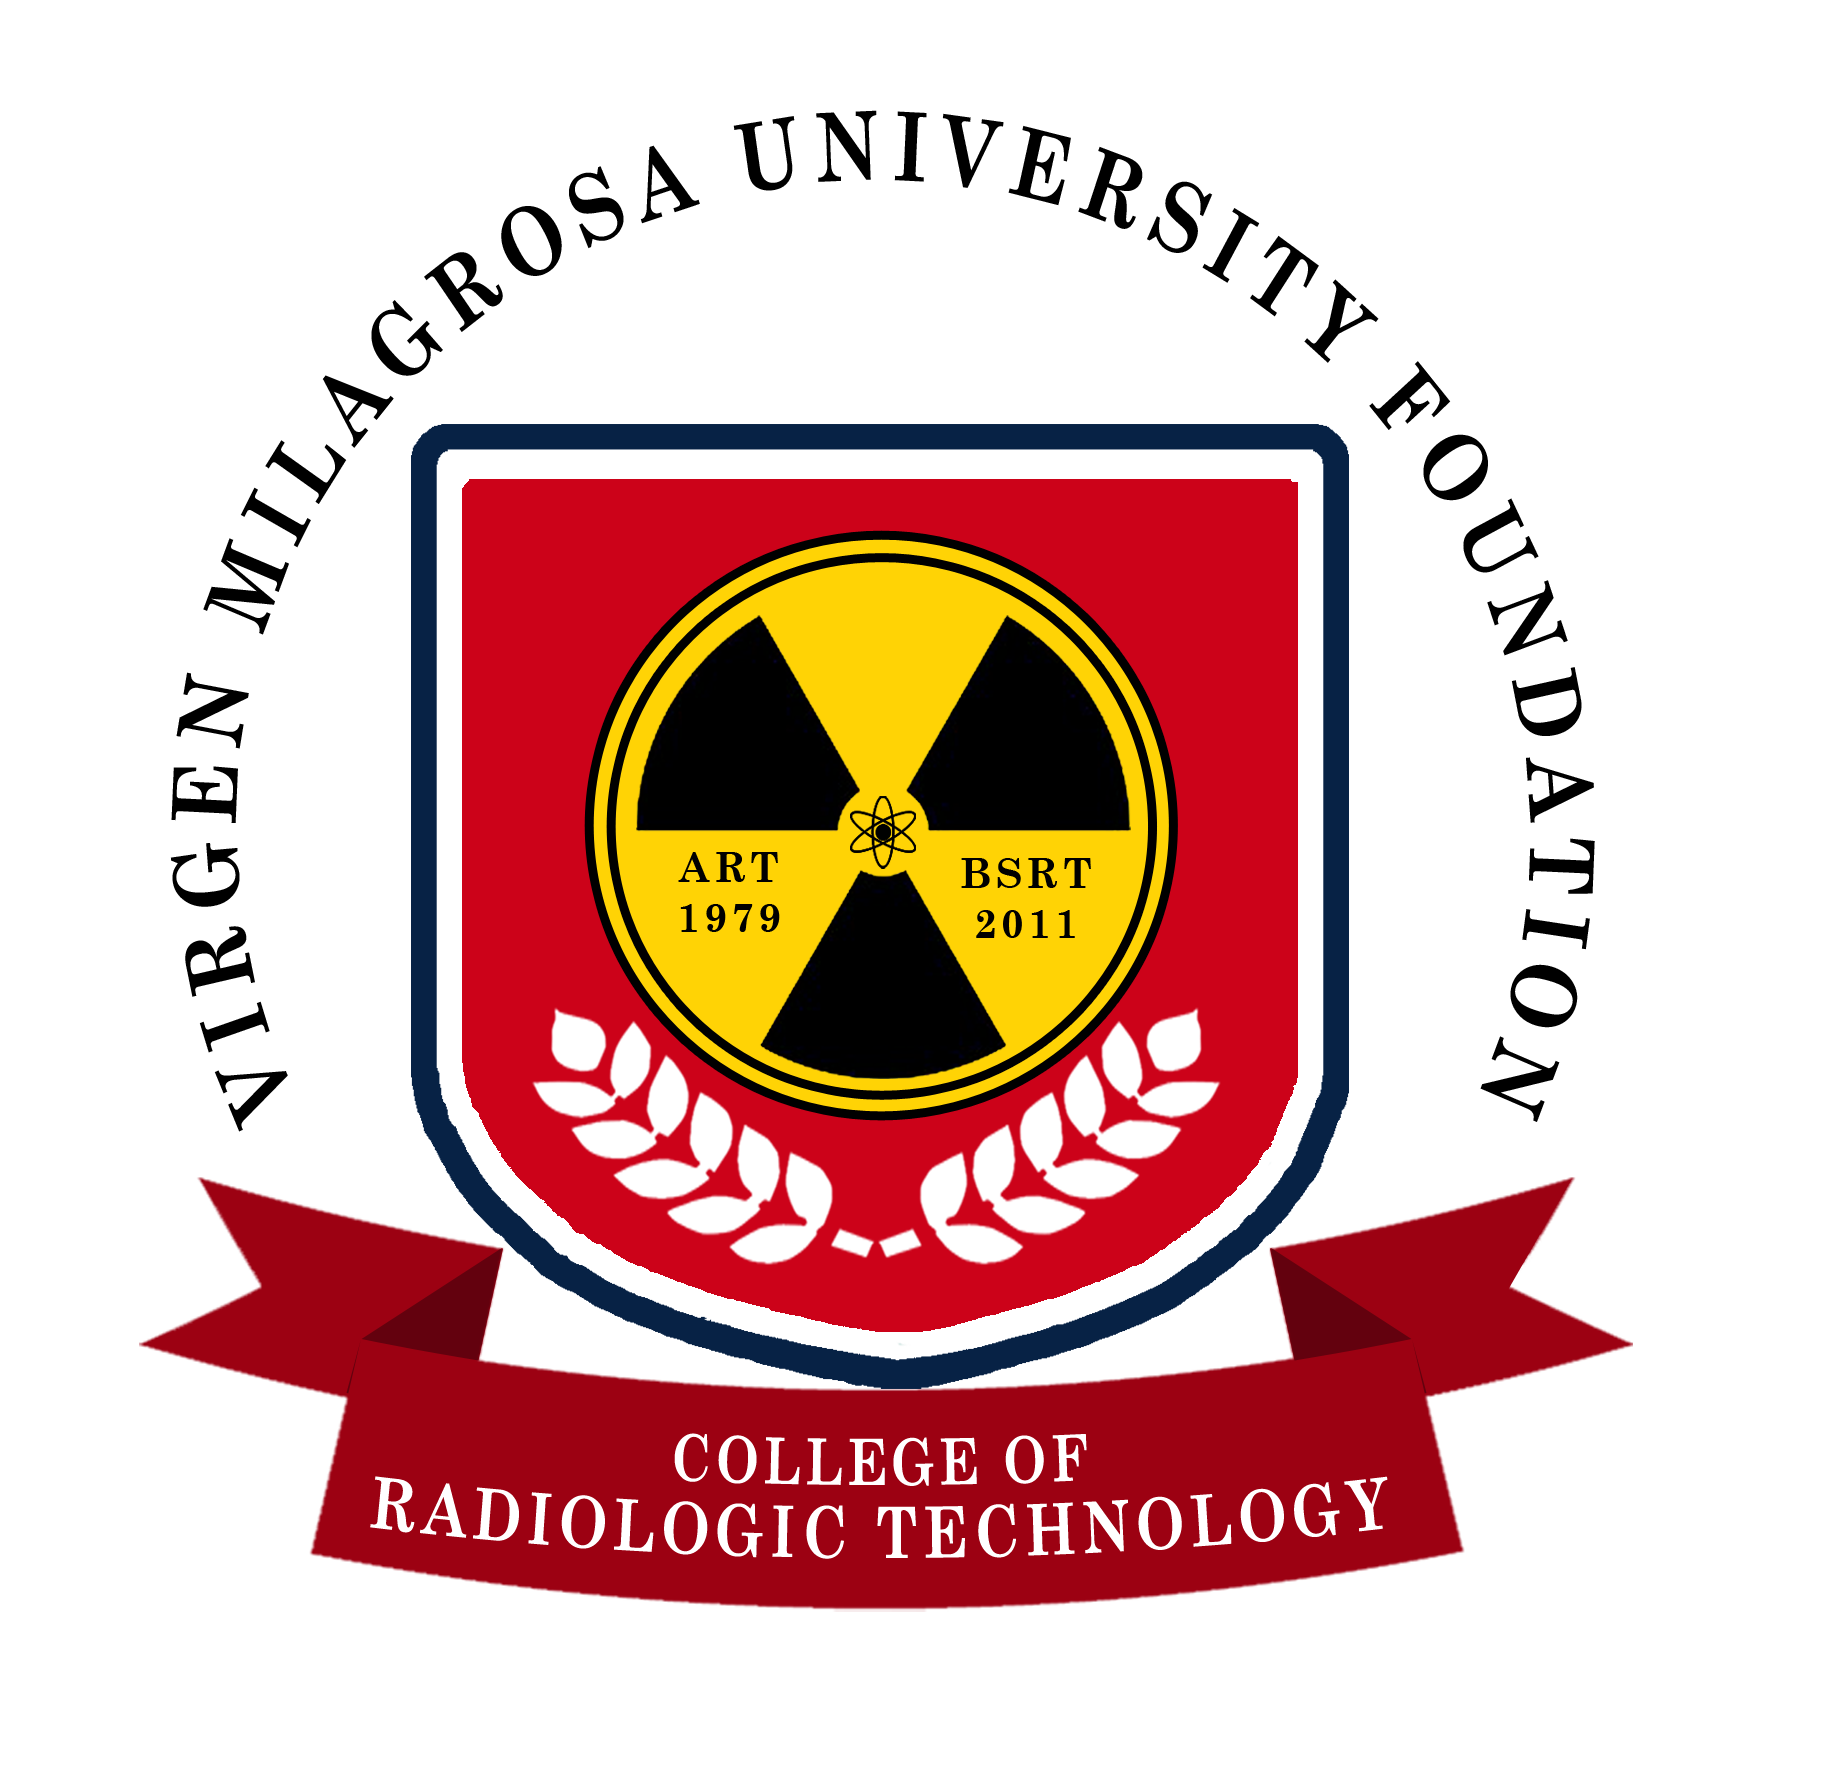 Virgen milagrosa university foundation home college of radiologic technology buycottarizona Image collections